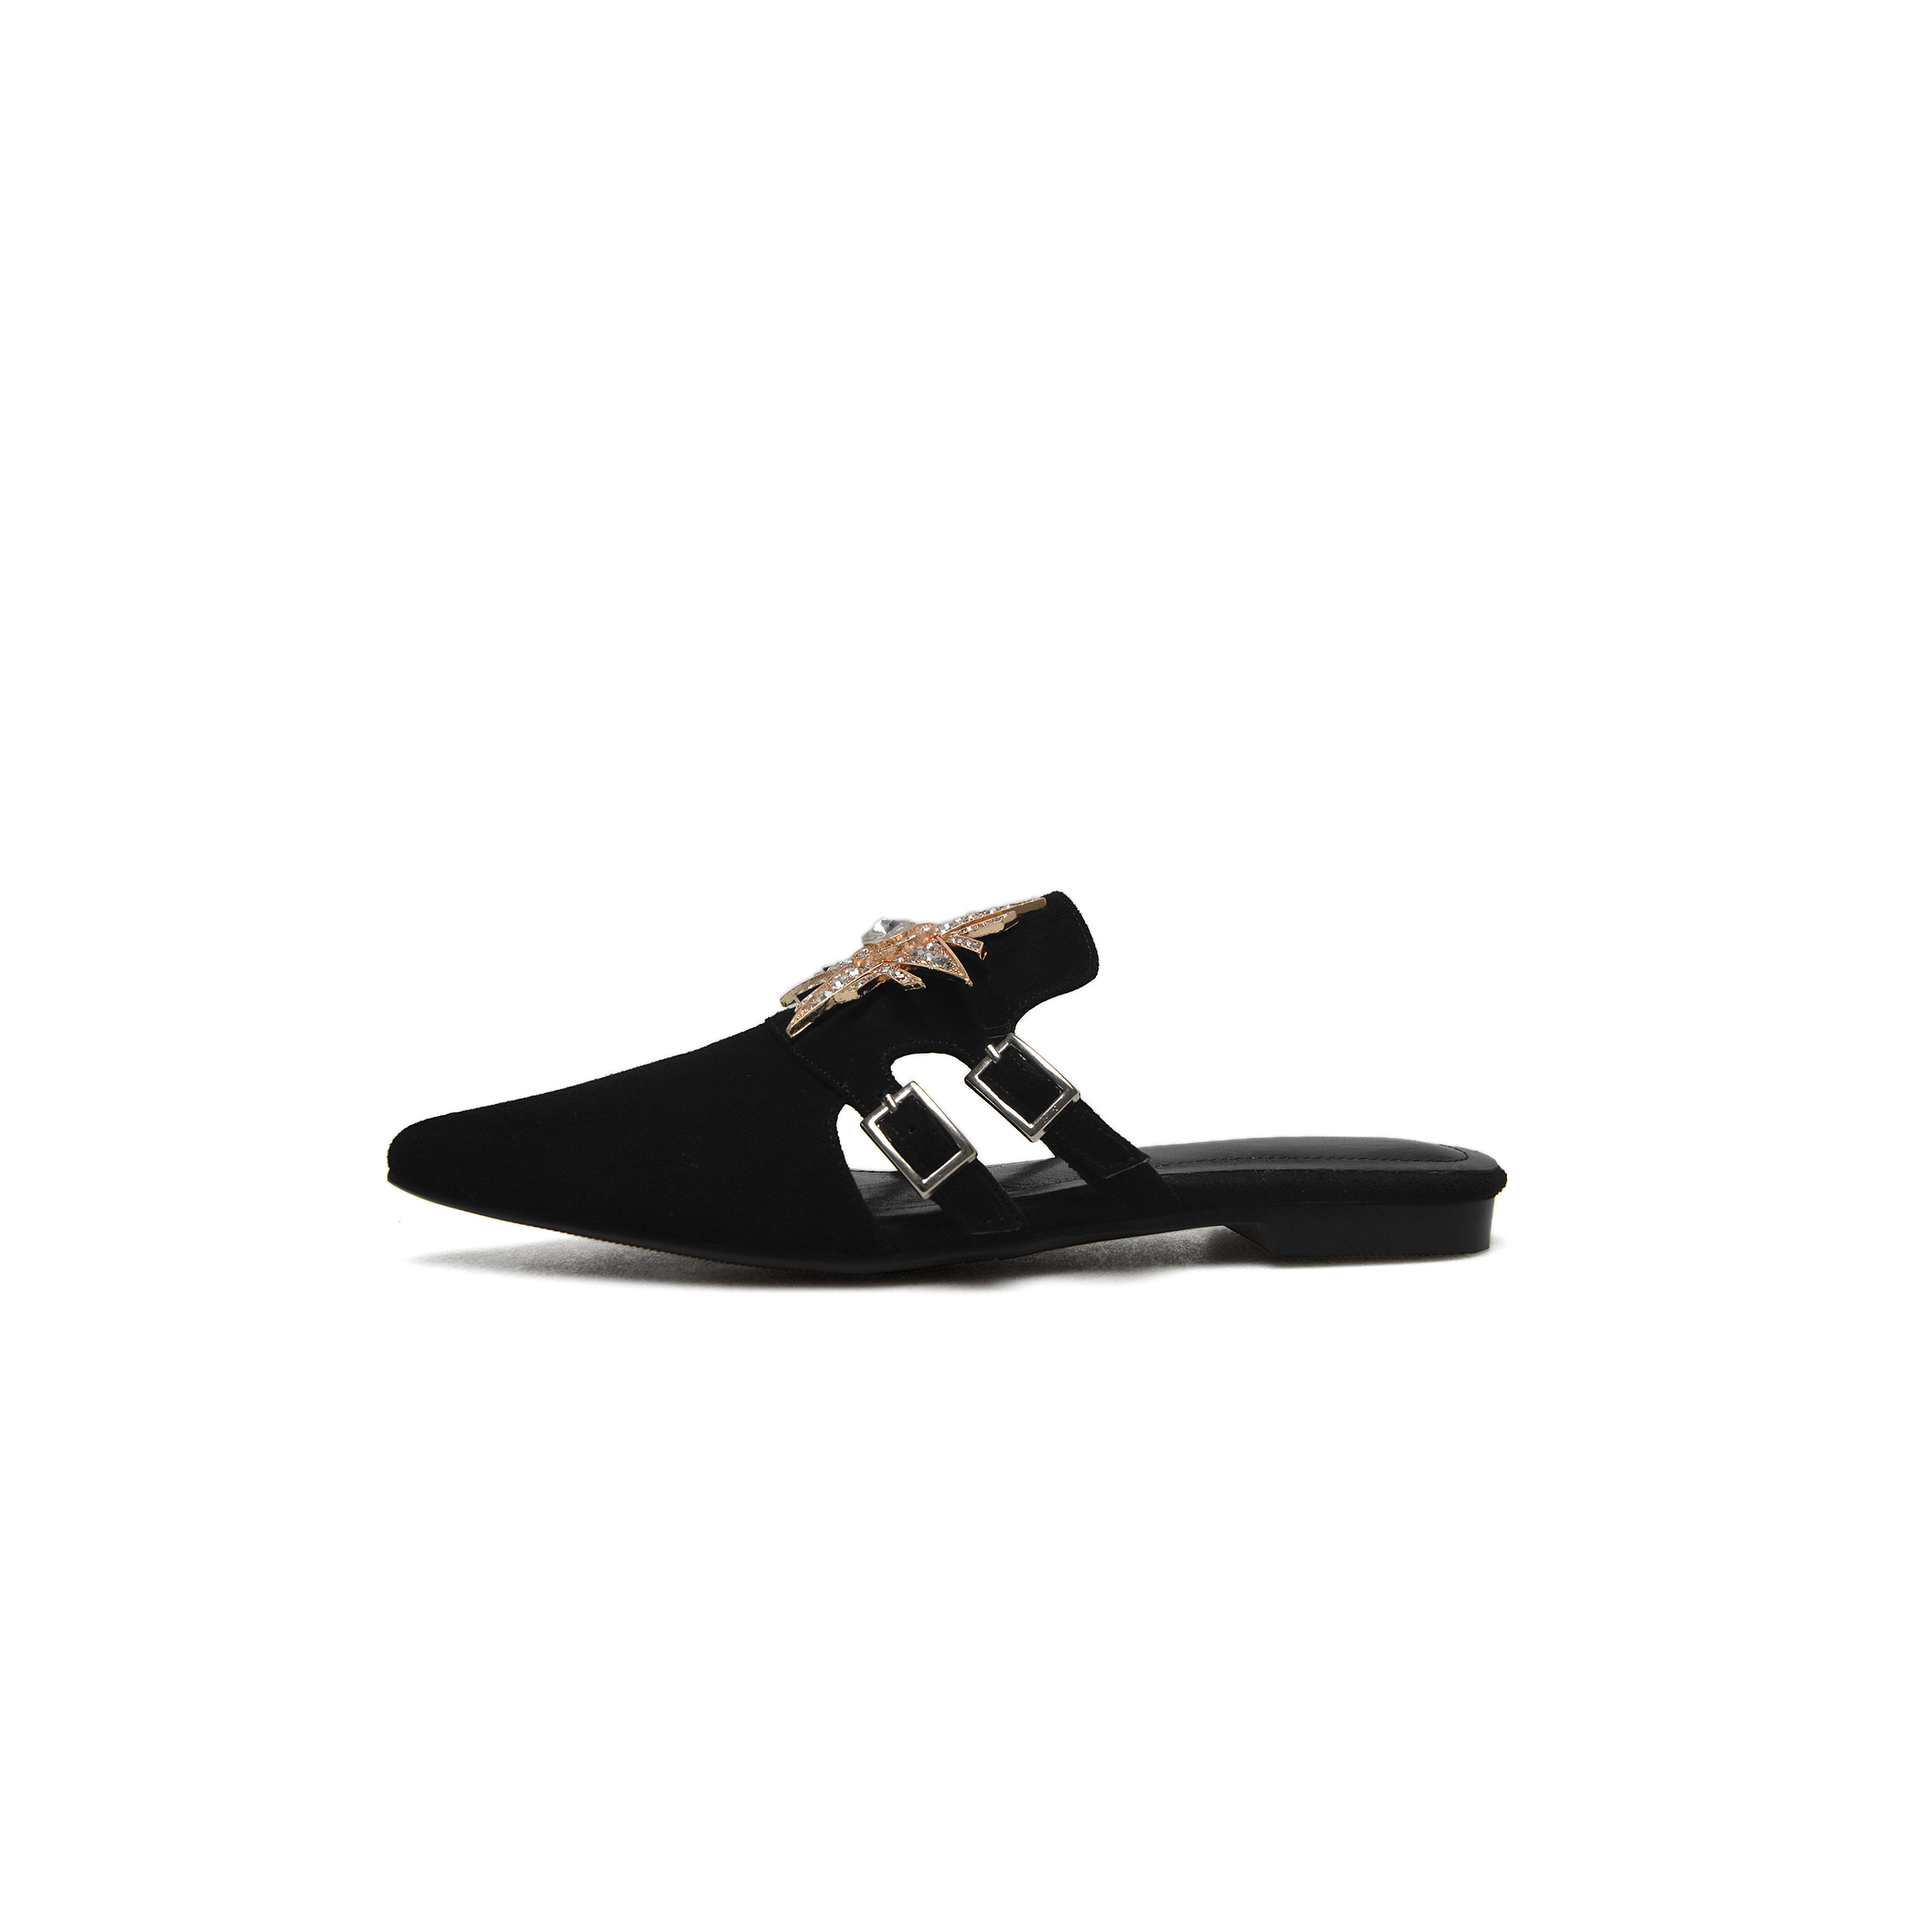 0ca3e8f92 US  46 - 2018 summer fashion mules slippers big size slides woman big size  shoes - www.ardenfurtado.com